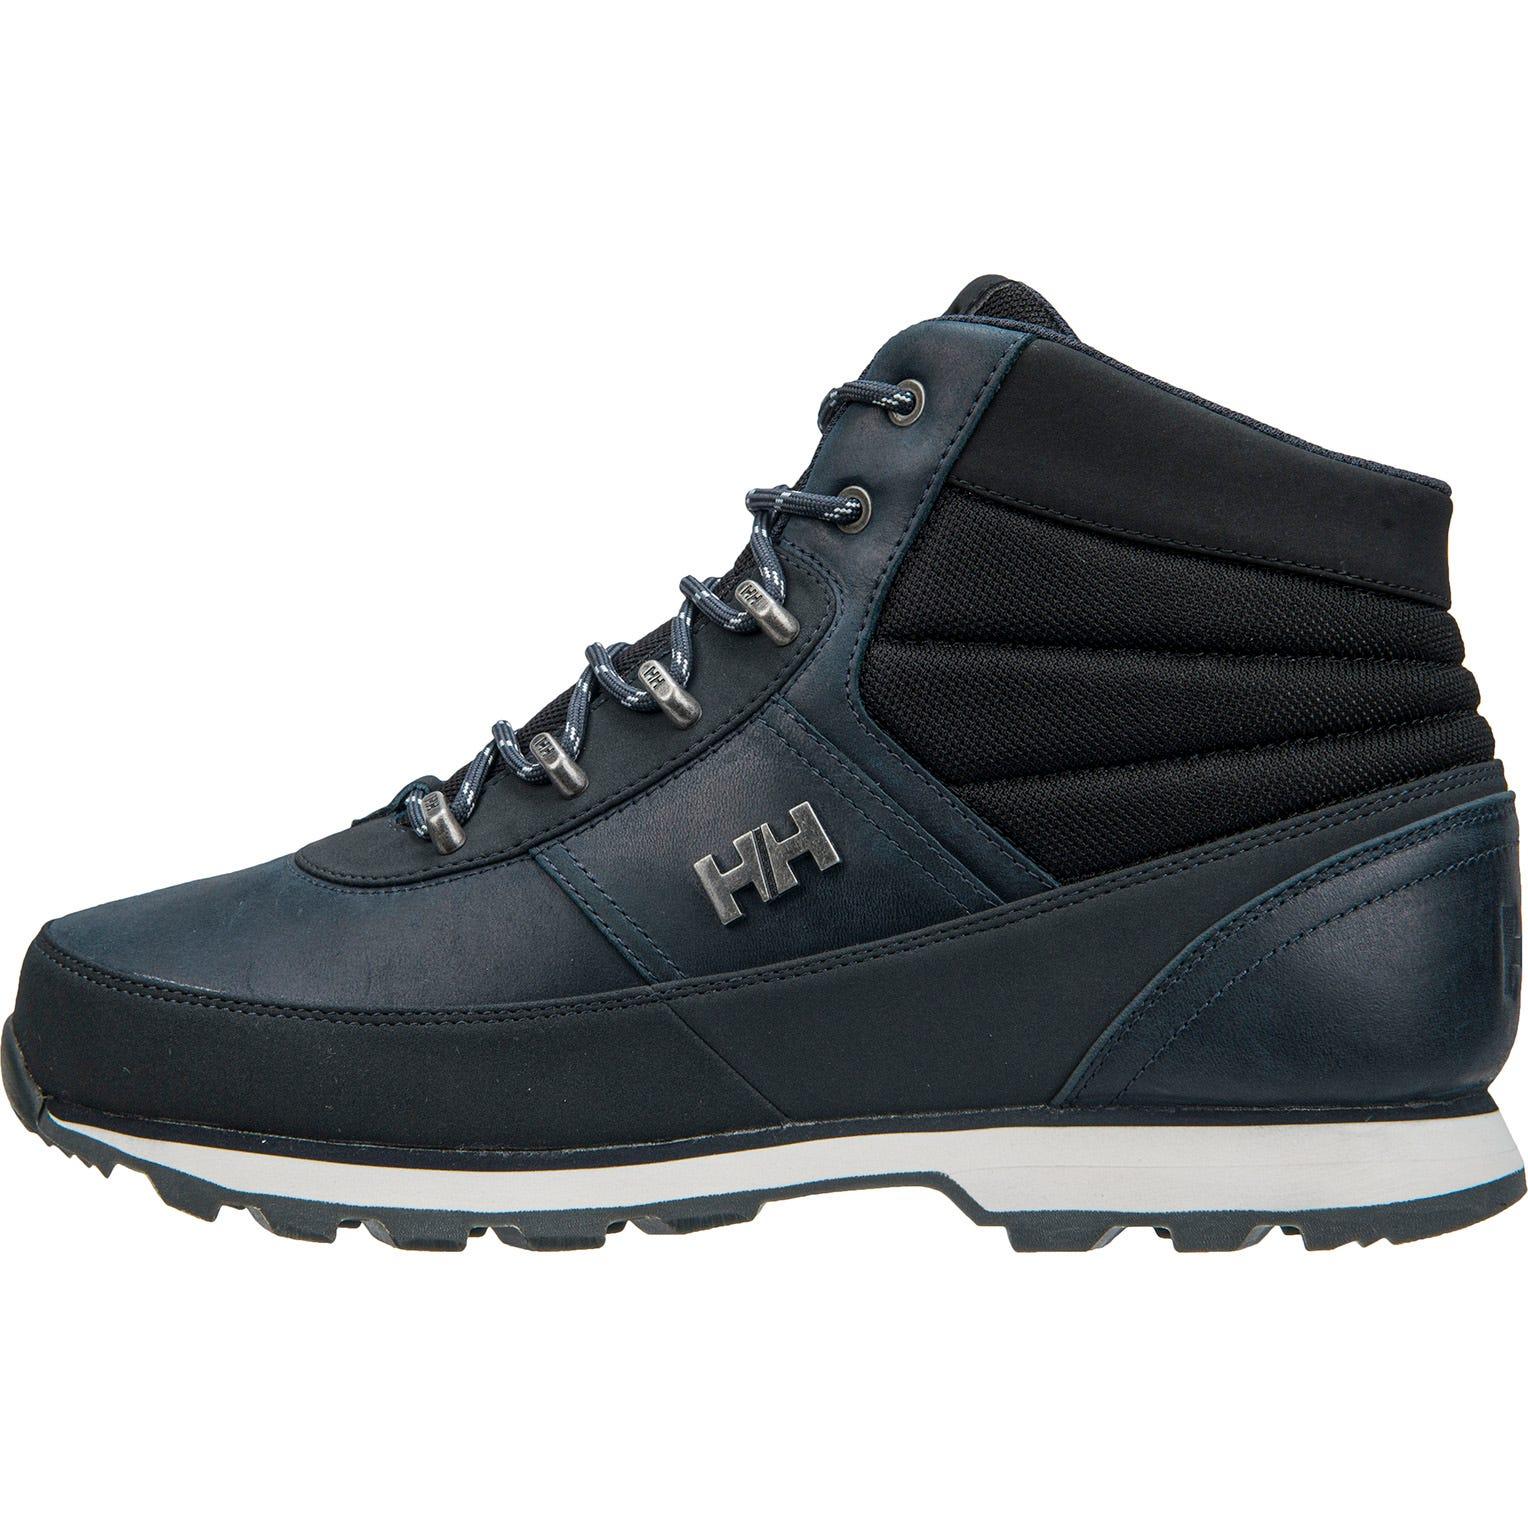 Helly Hansen Woodlands Mens Winter Boot Navy 46.5/12